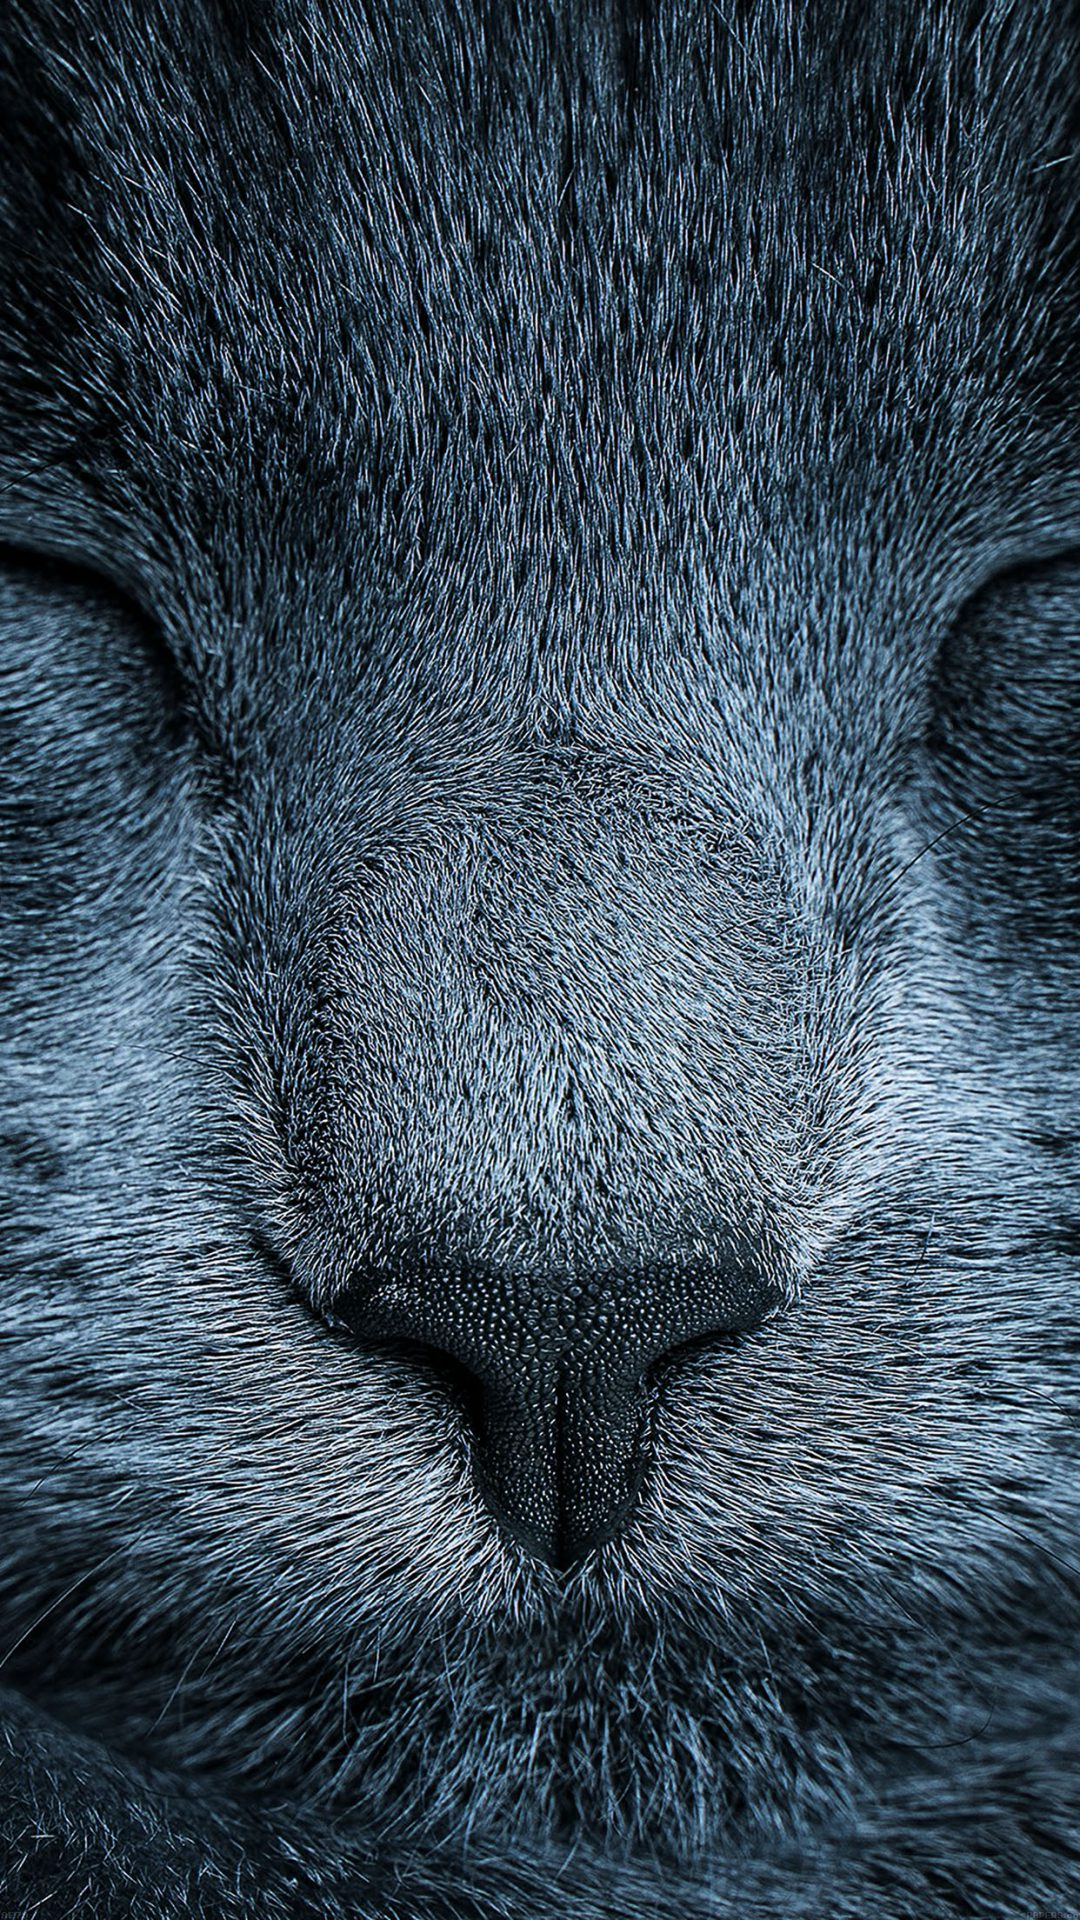 Sleeping Blue Cat Zoom Nature